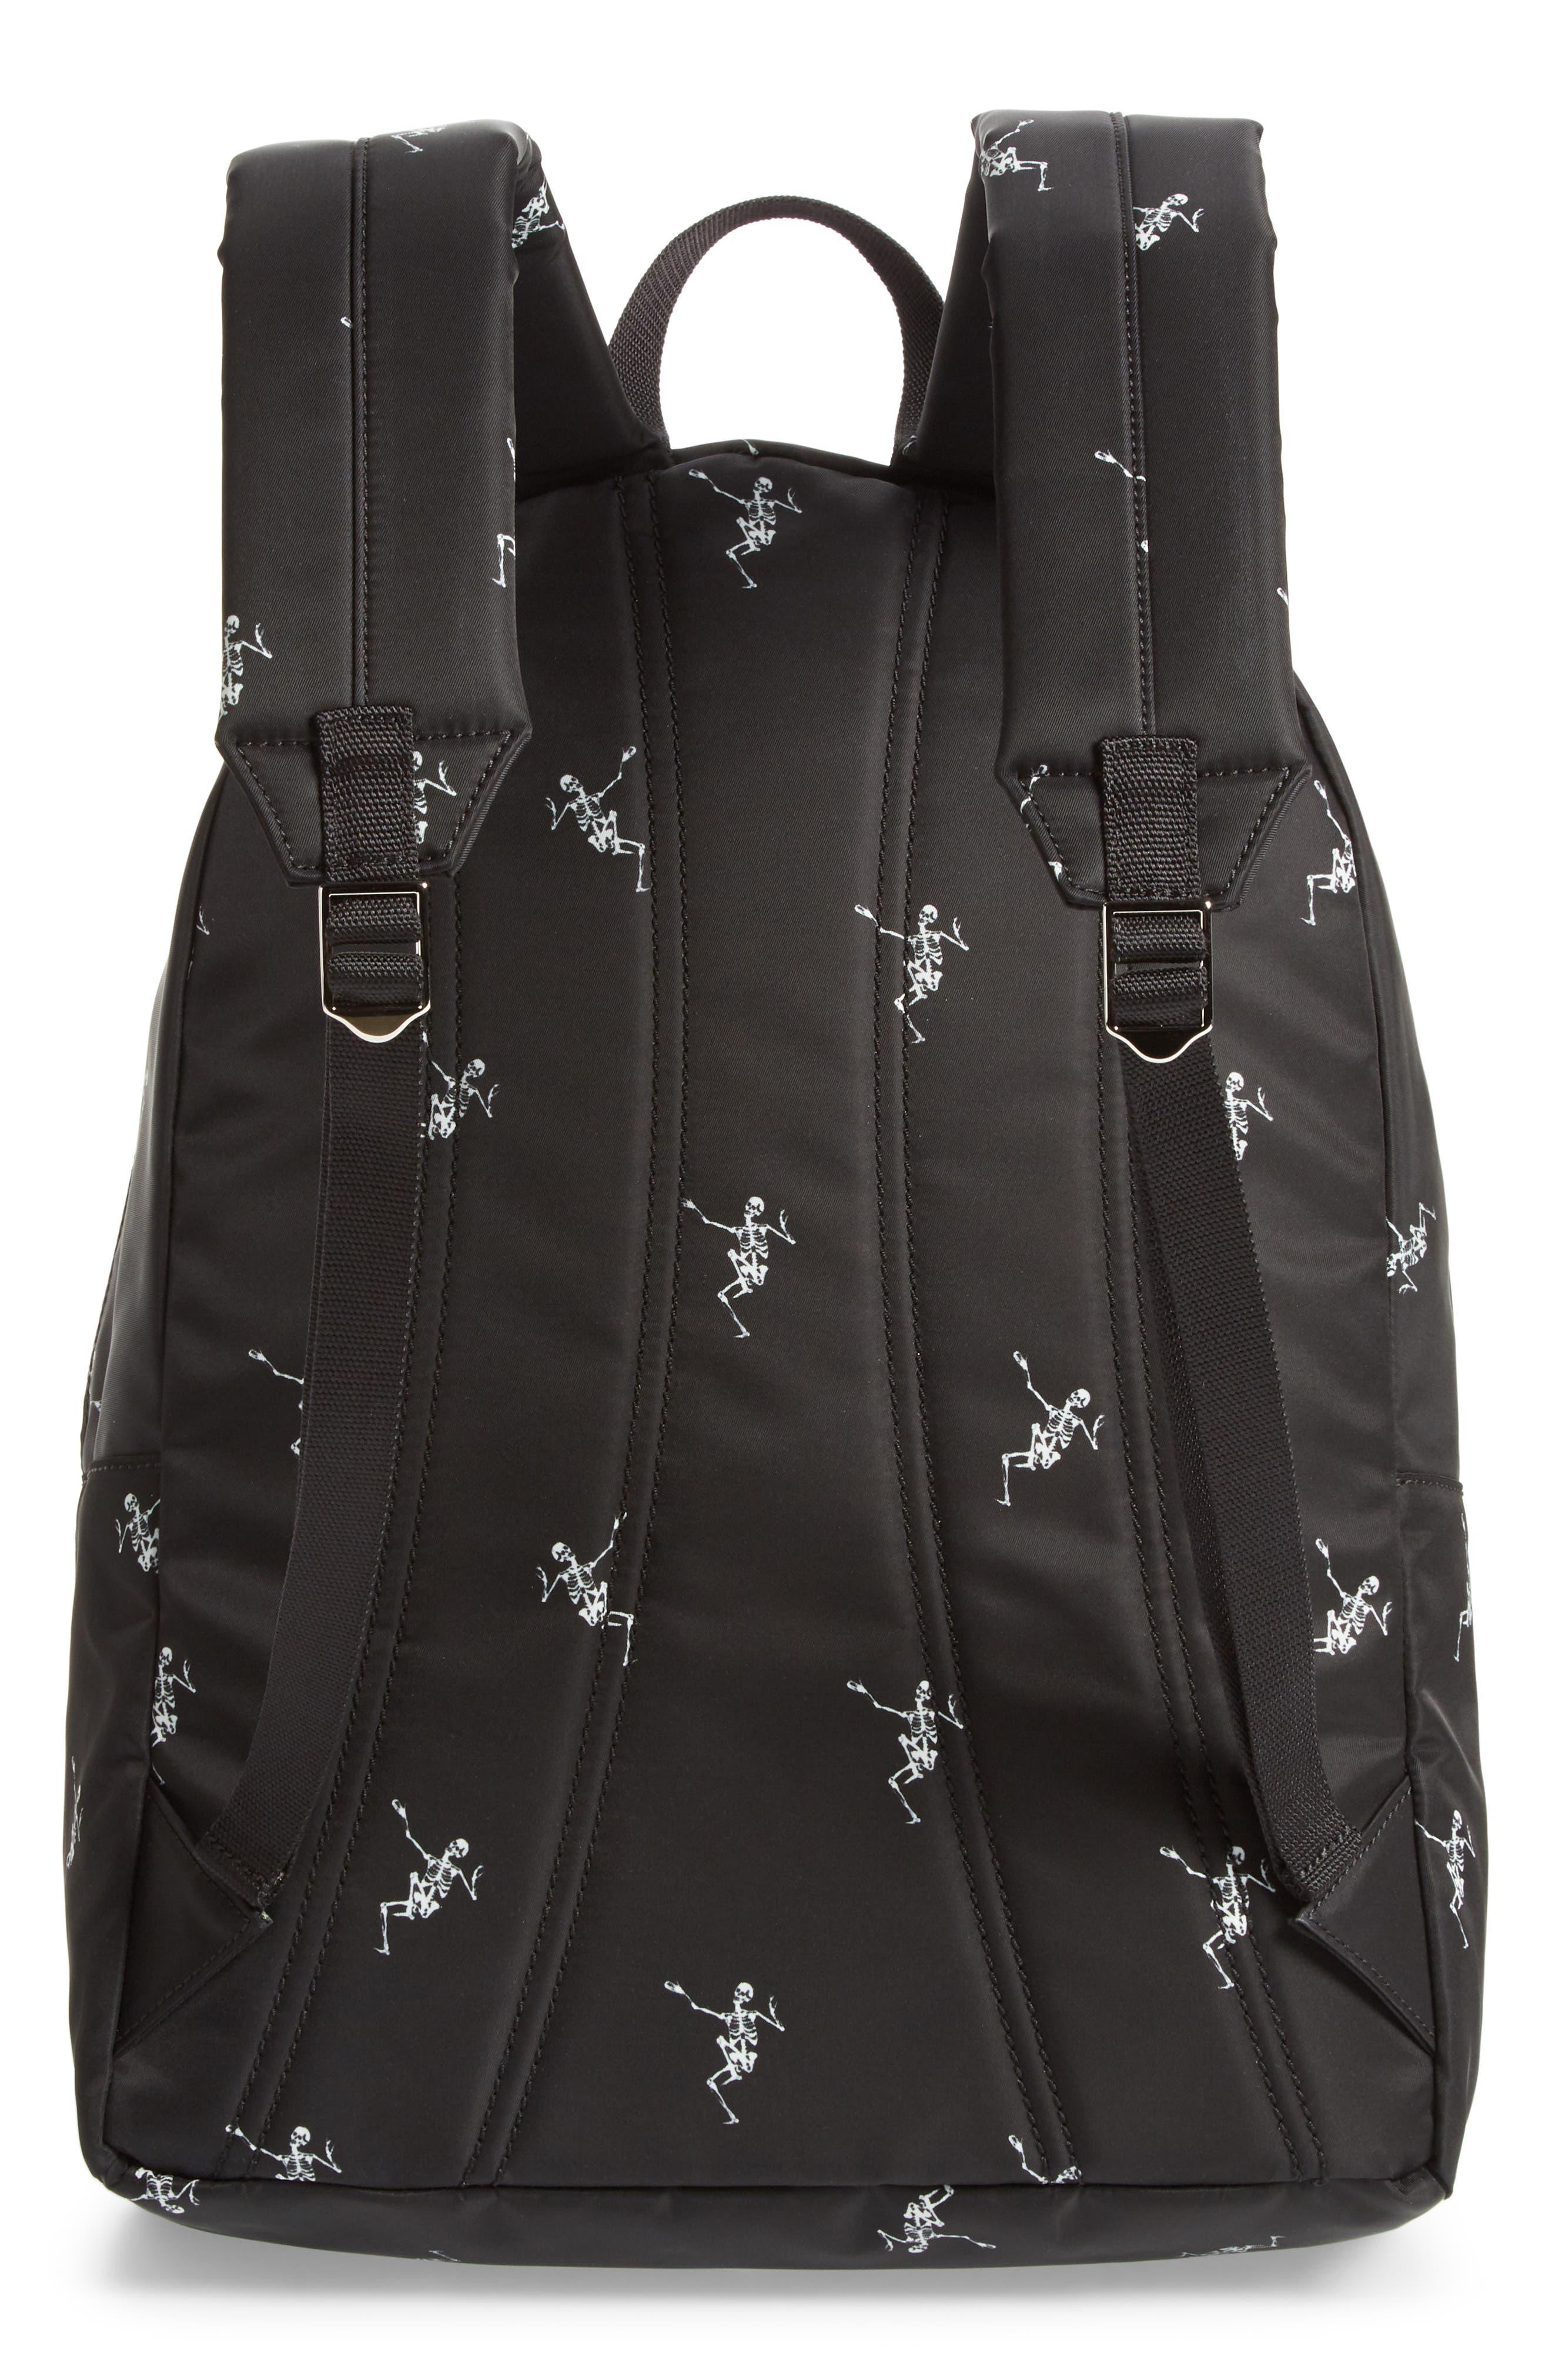 Dancing Skeleton Backpack,                             Alternate thumbnail 3, color,                             BLACK/ OFF WHITE